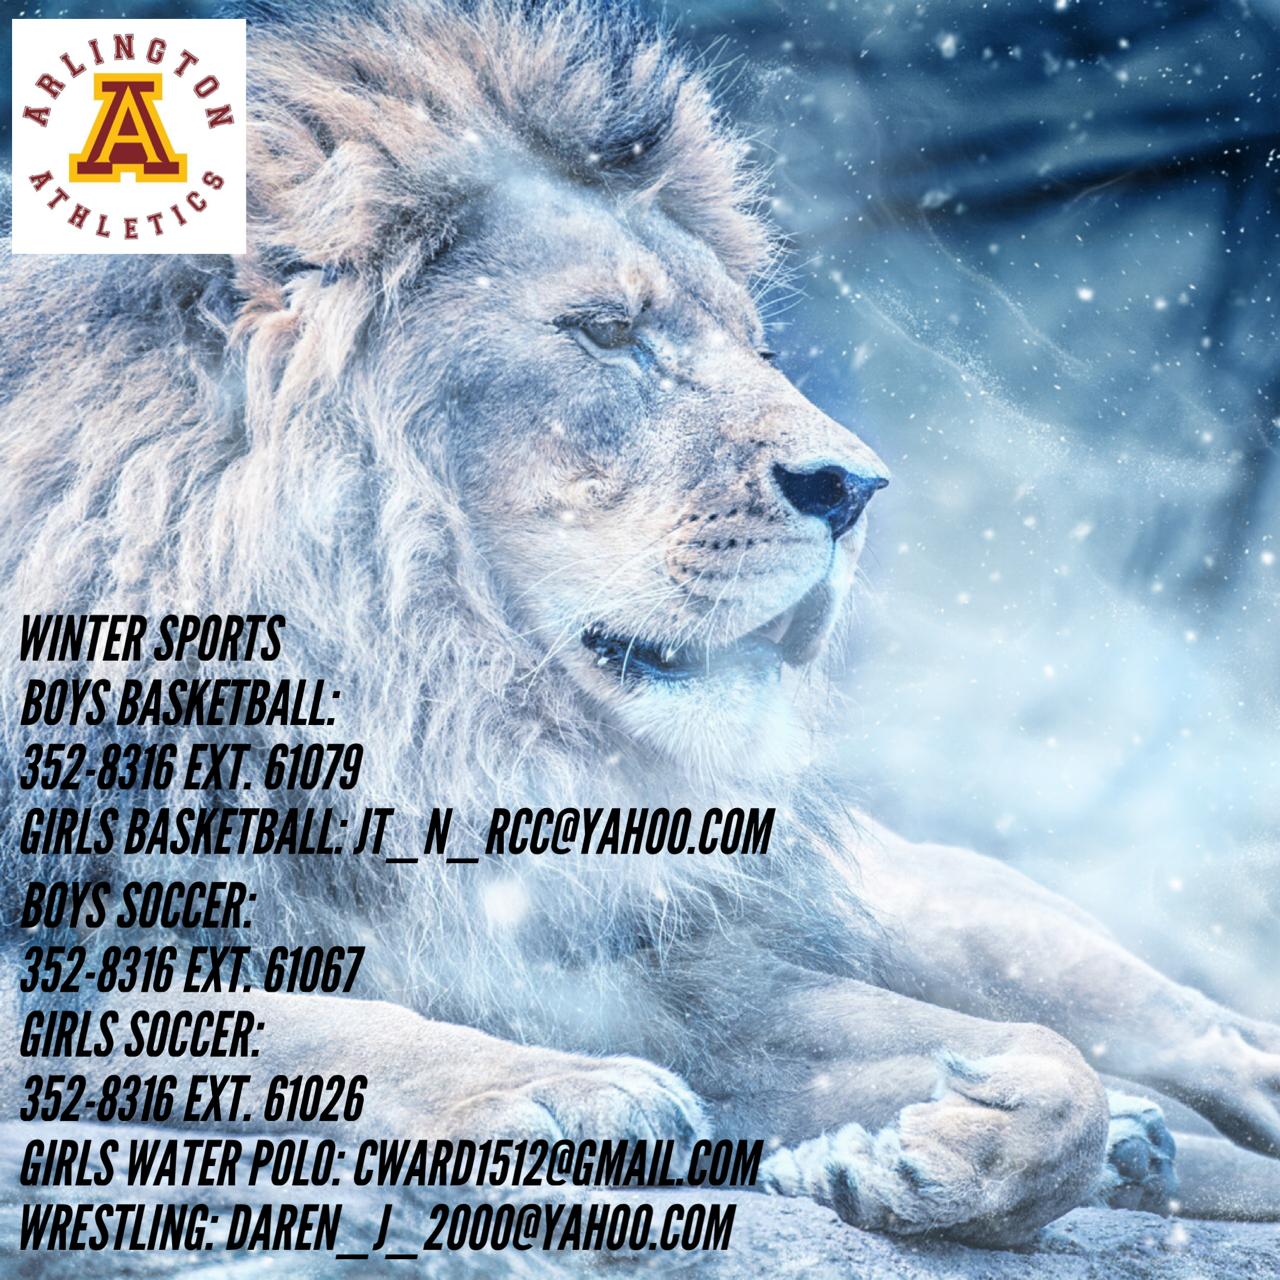 Arlington Winter Sports – Summer Contact Information.